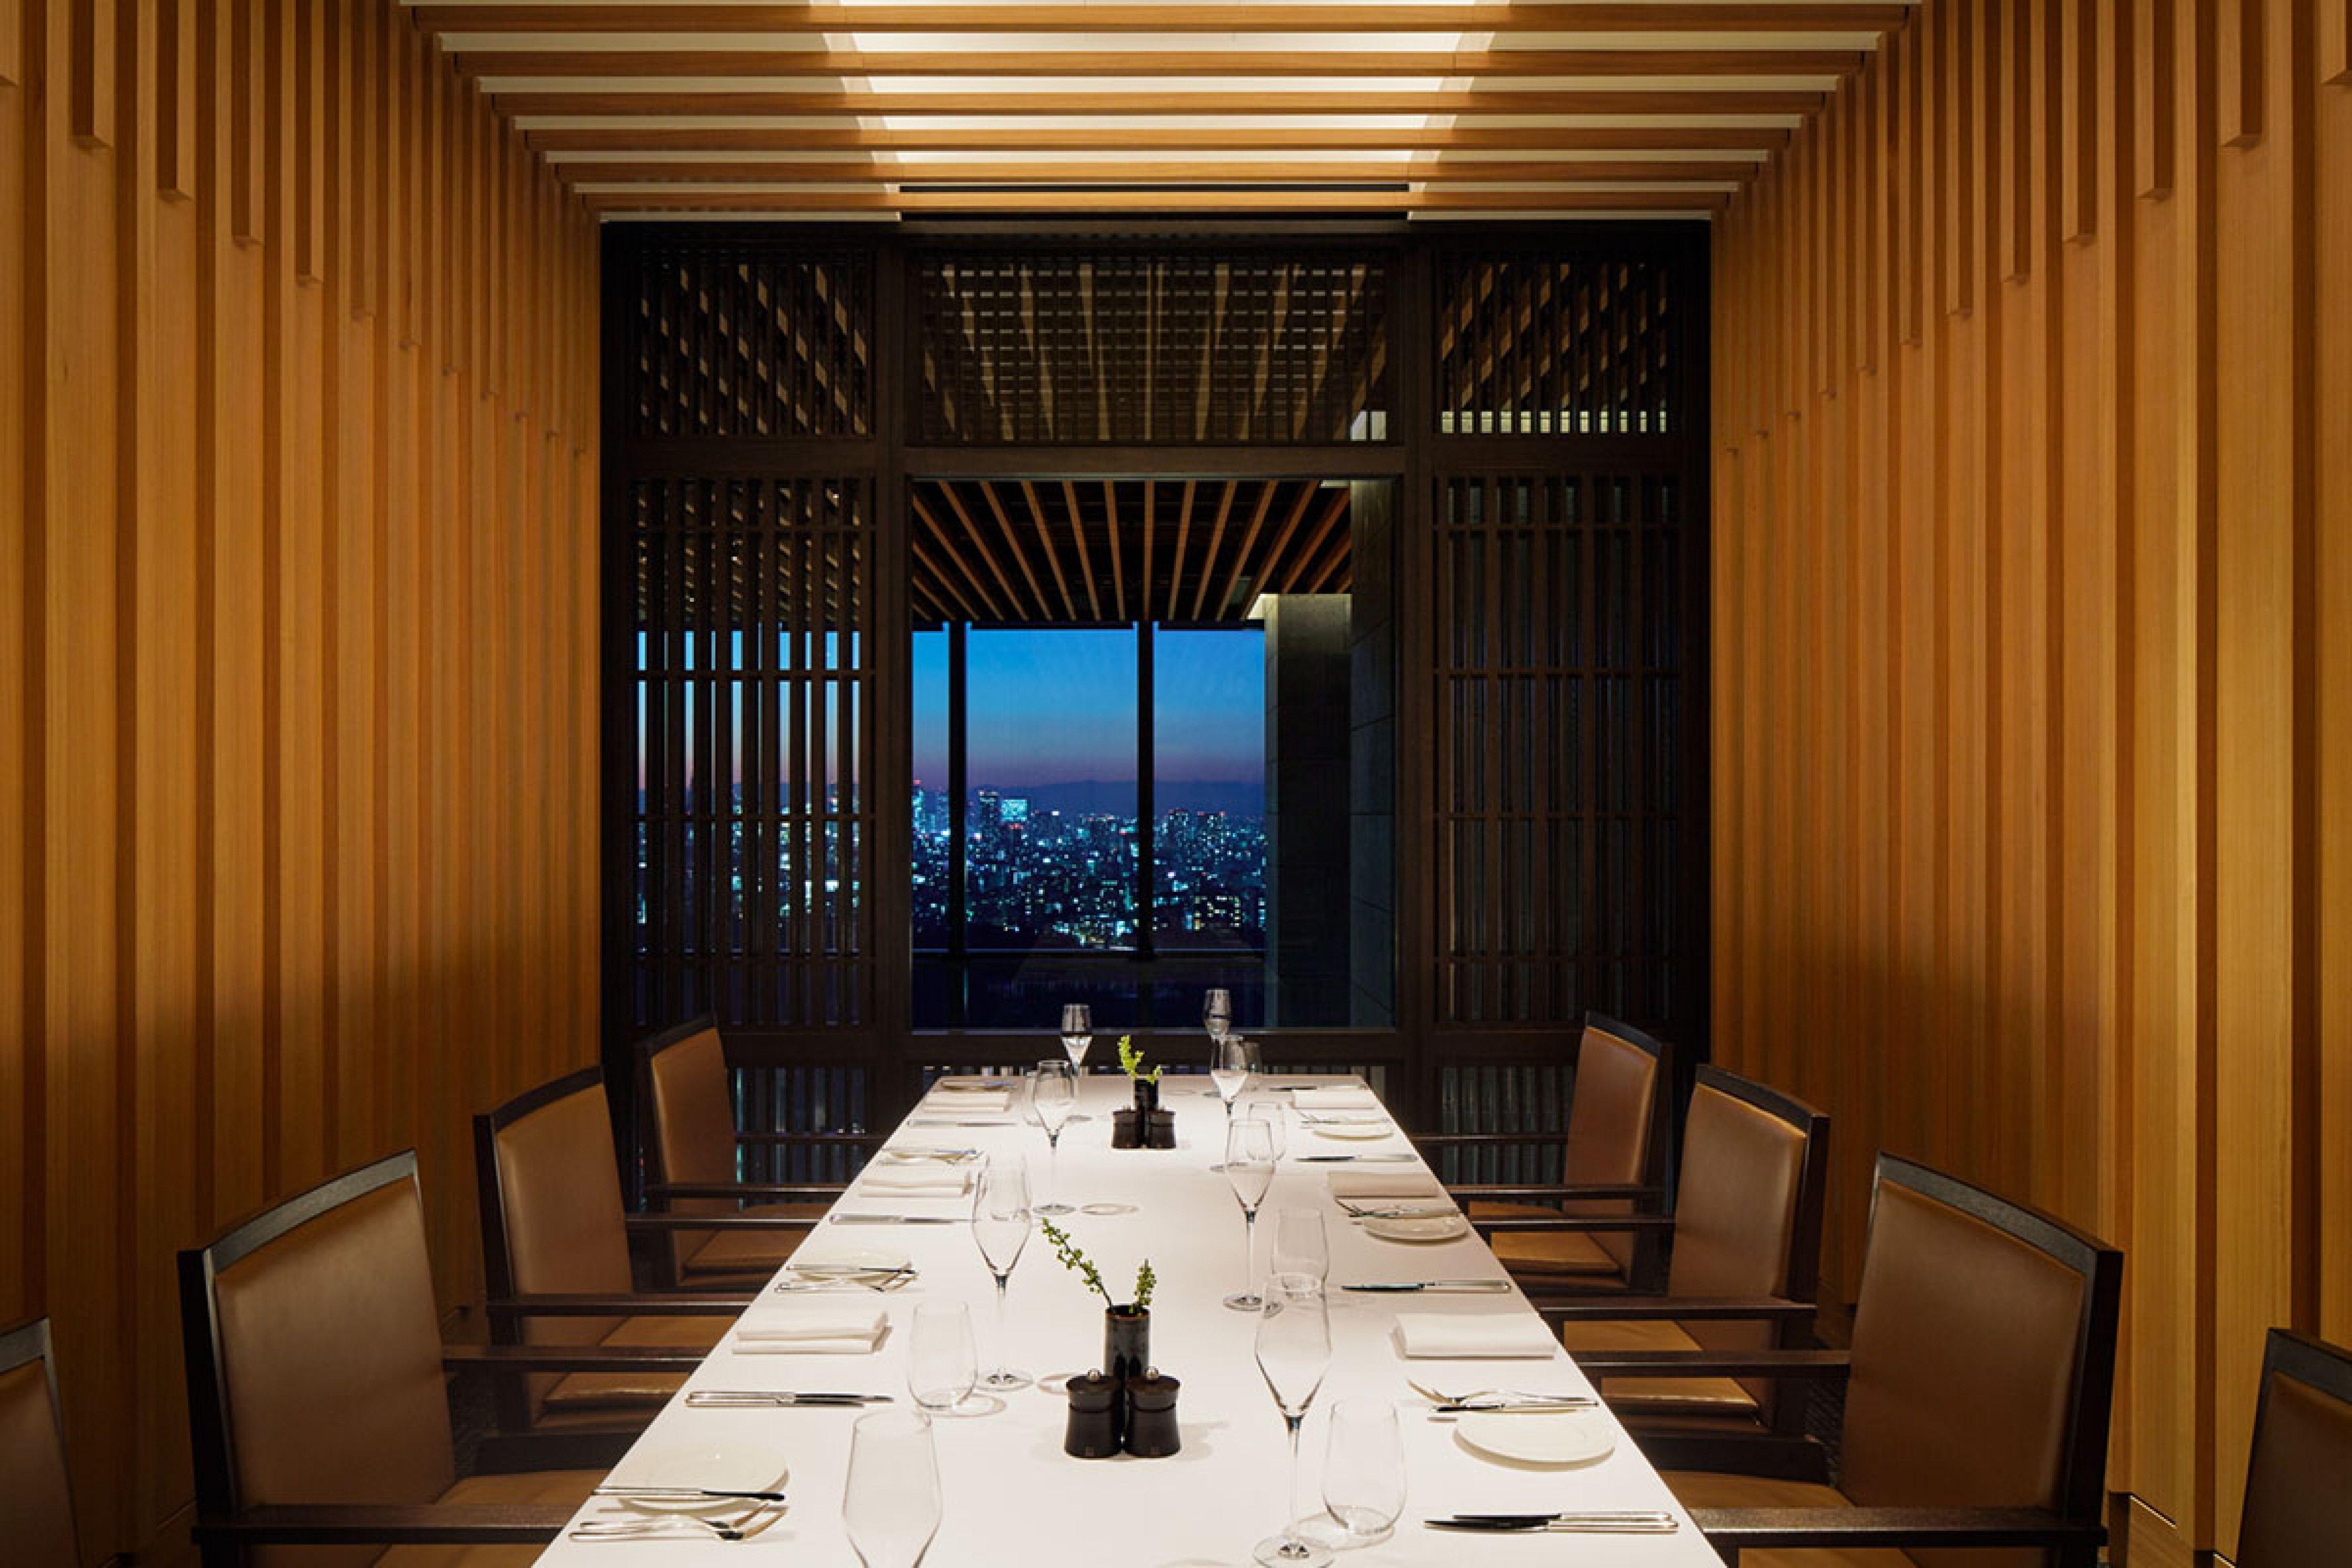 Luxury tokyo Hotels Fresh Aman tokyo Gallery Explore Our Luxury tokyo Hotel Aman